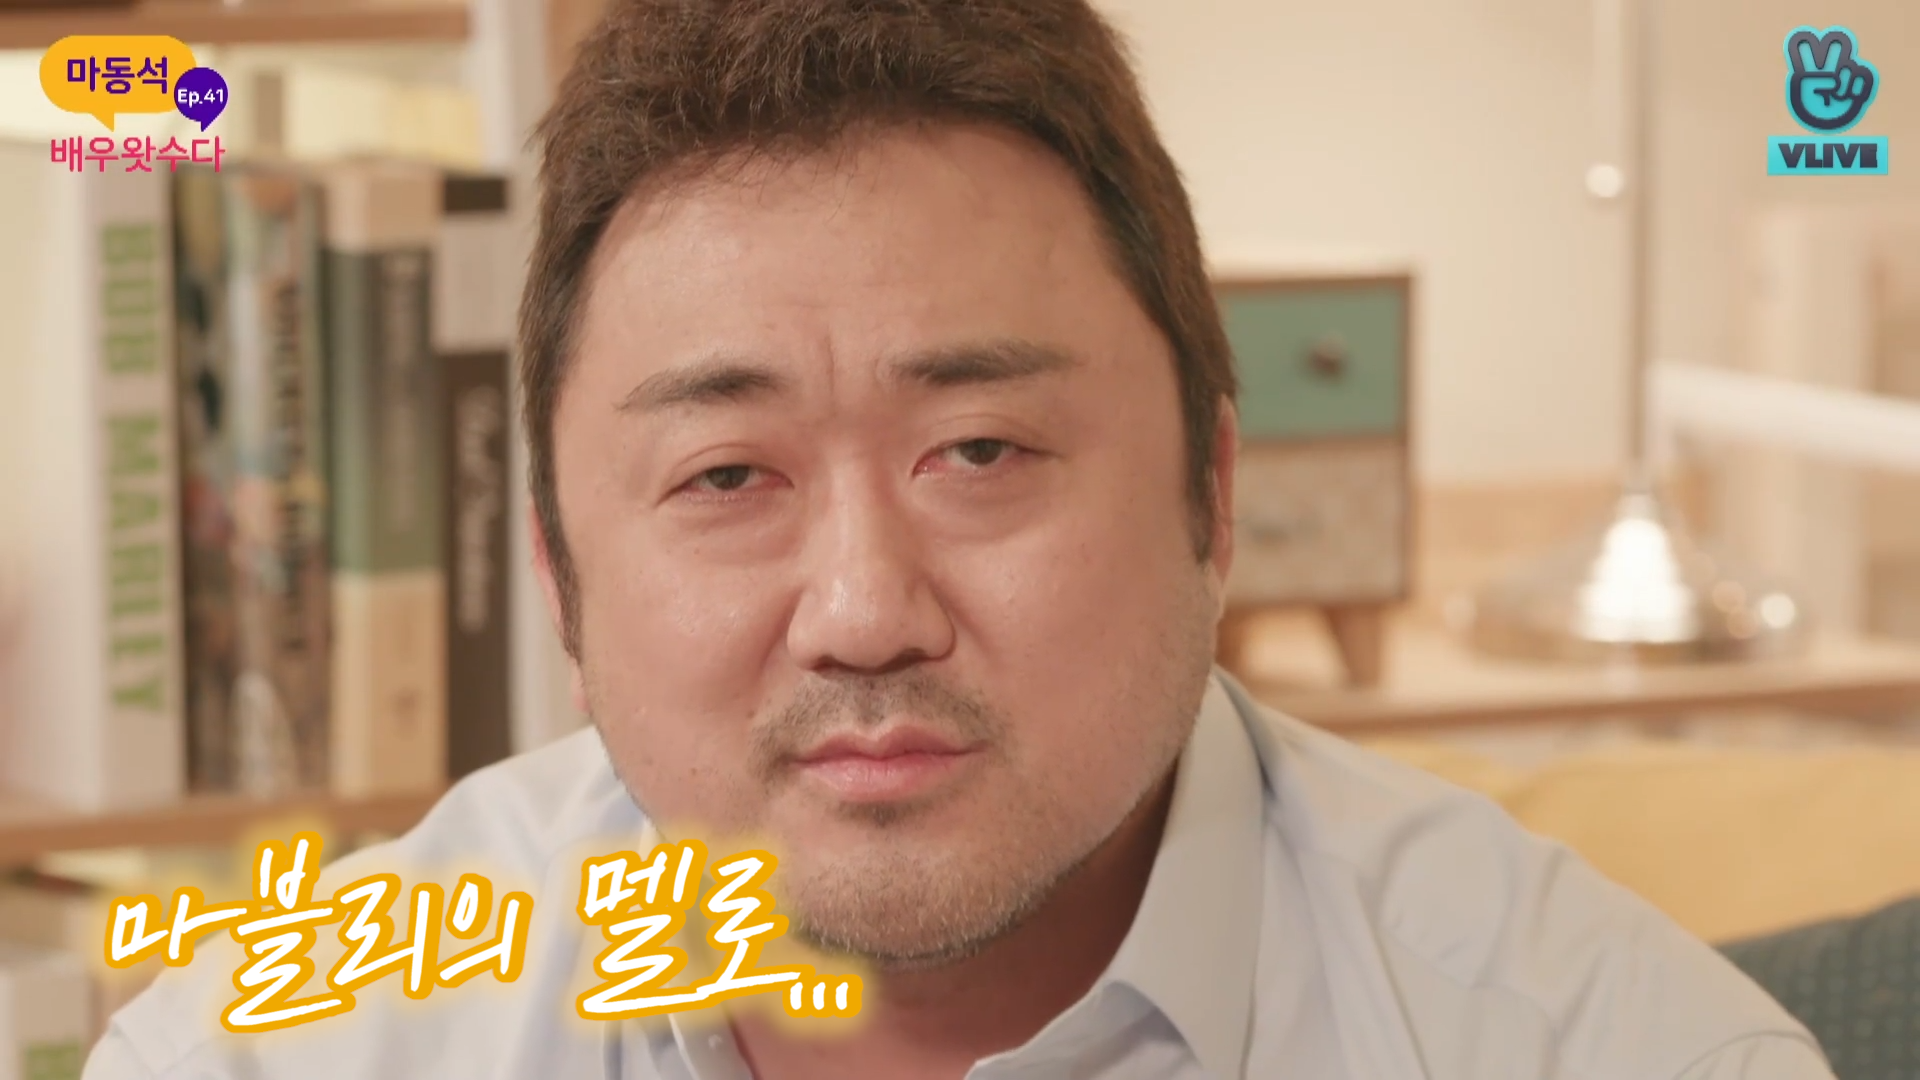 [V MOVIE] 마블리 마요미 마티쥬가 좋아하는 소고기김밥을 소고기 부위별로 준비해봤습니다 (Ma Dong Seok's melodramatic look)